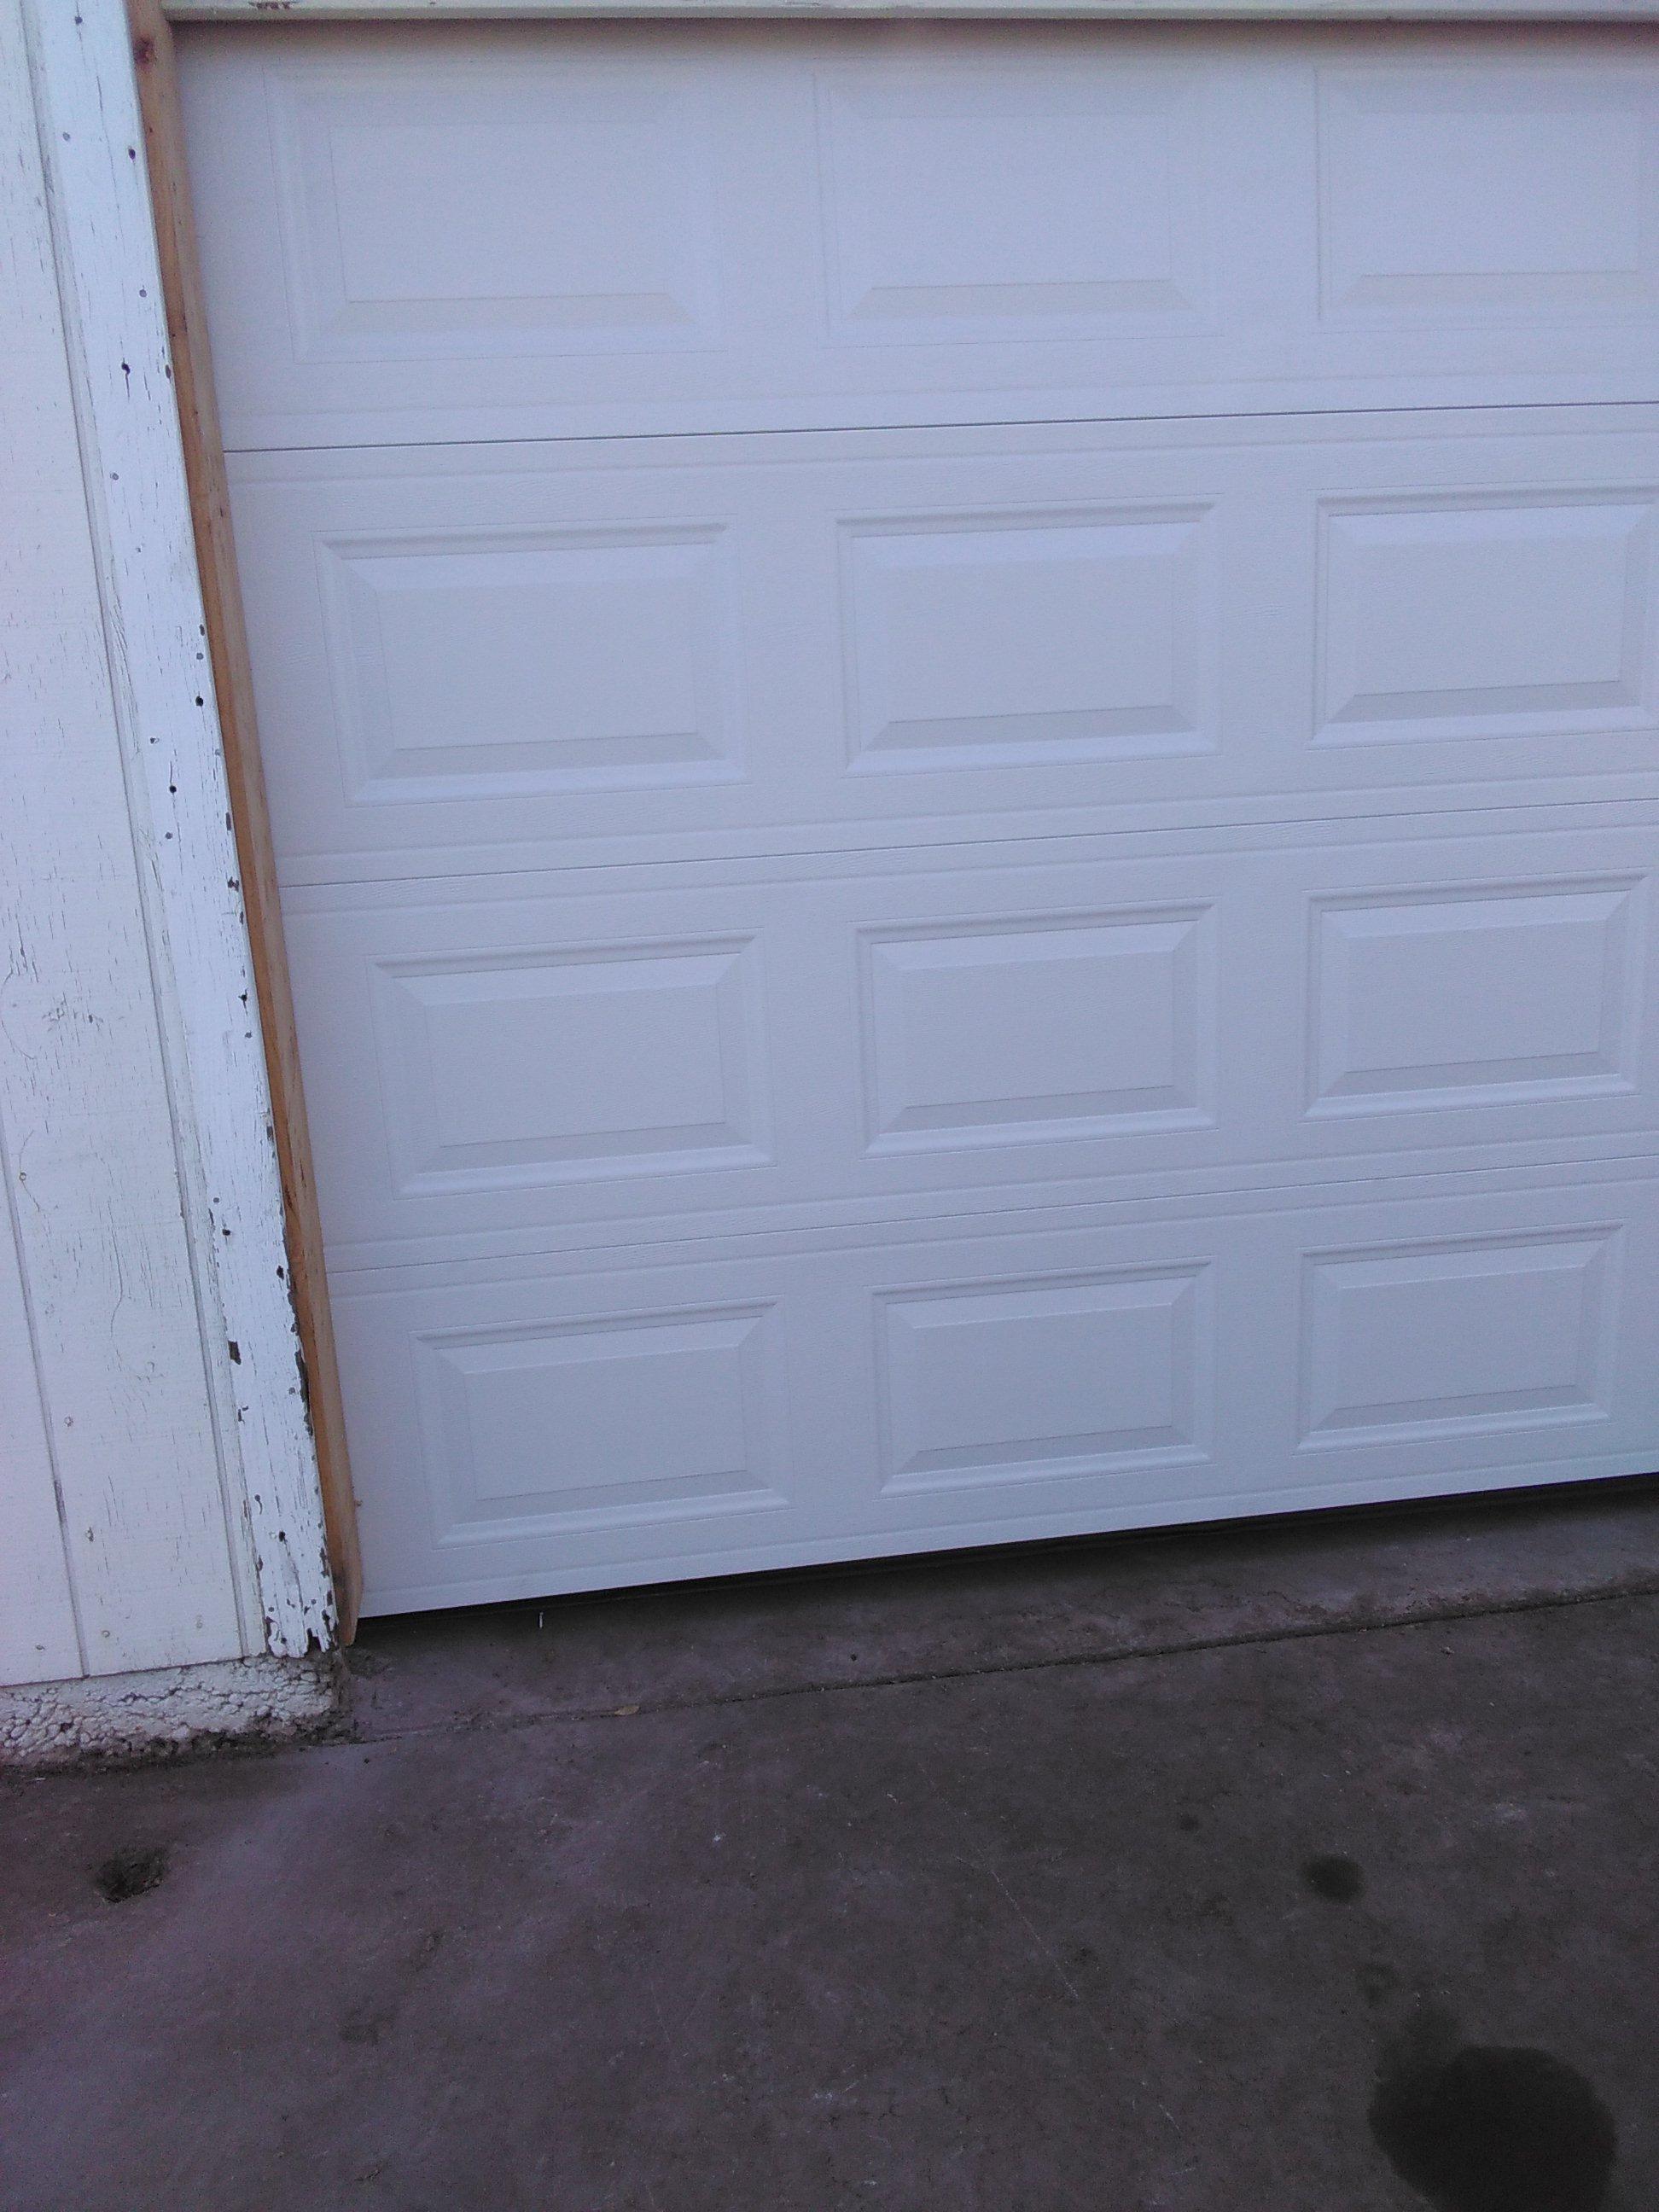 Fresno Madera Garage Door Repair Experts 214 Alamos Ave, Clovis, CA 93612    YP.com